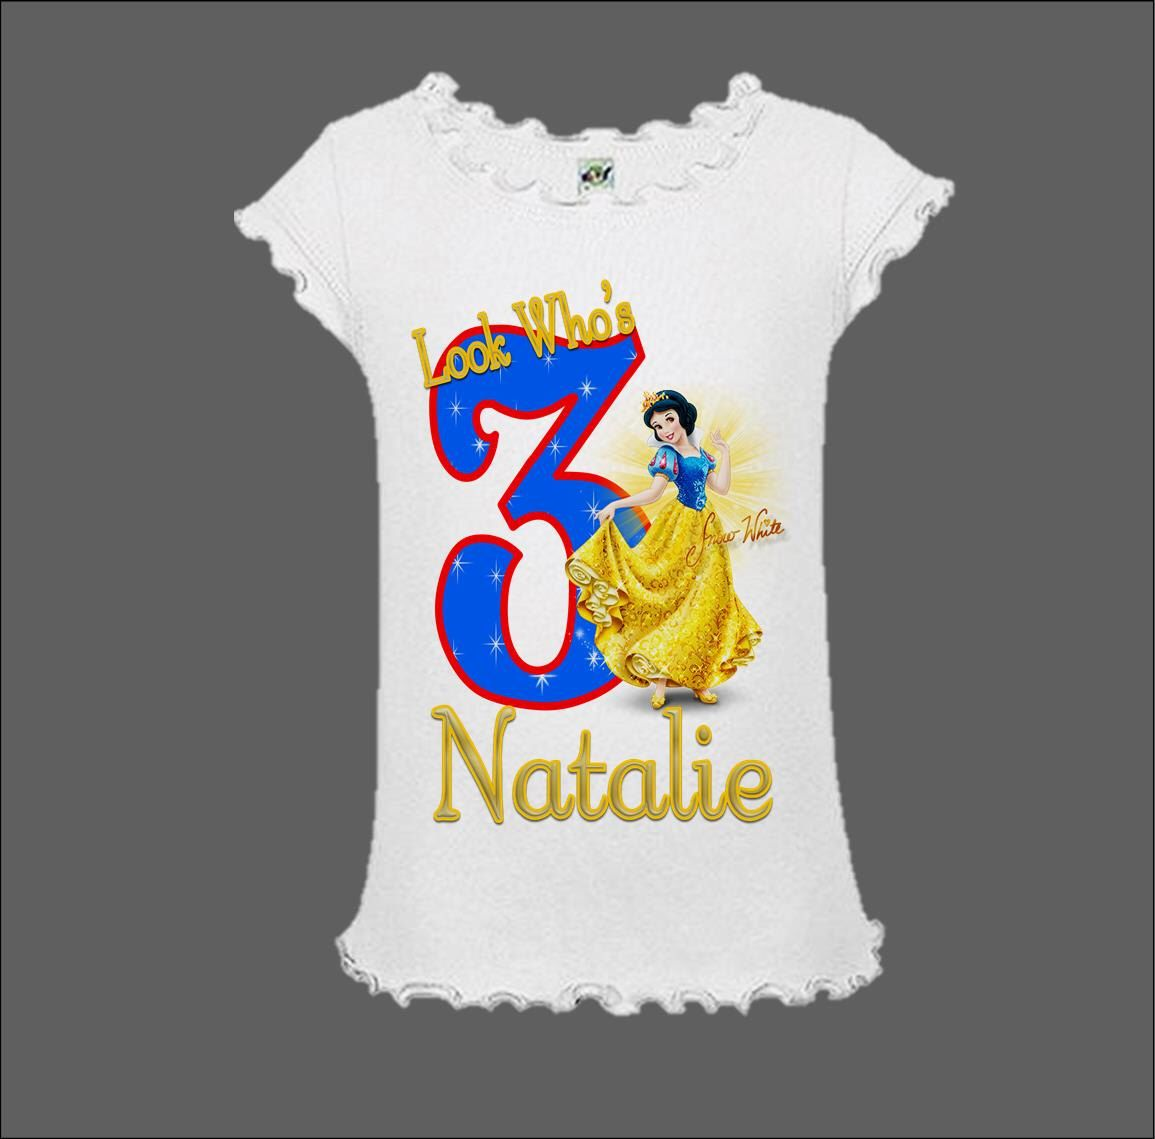 Snow White Birthday Shirt//Snow White Shirt//Princess Birthday Shirt//Snow White Outfit//Snow White Party Shirt